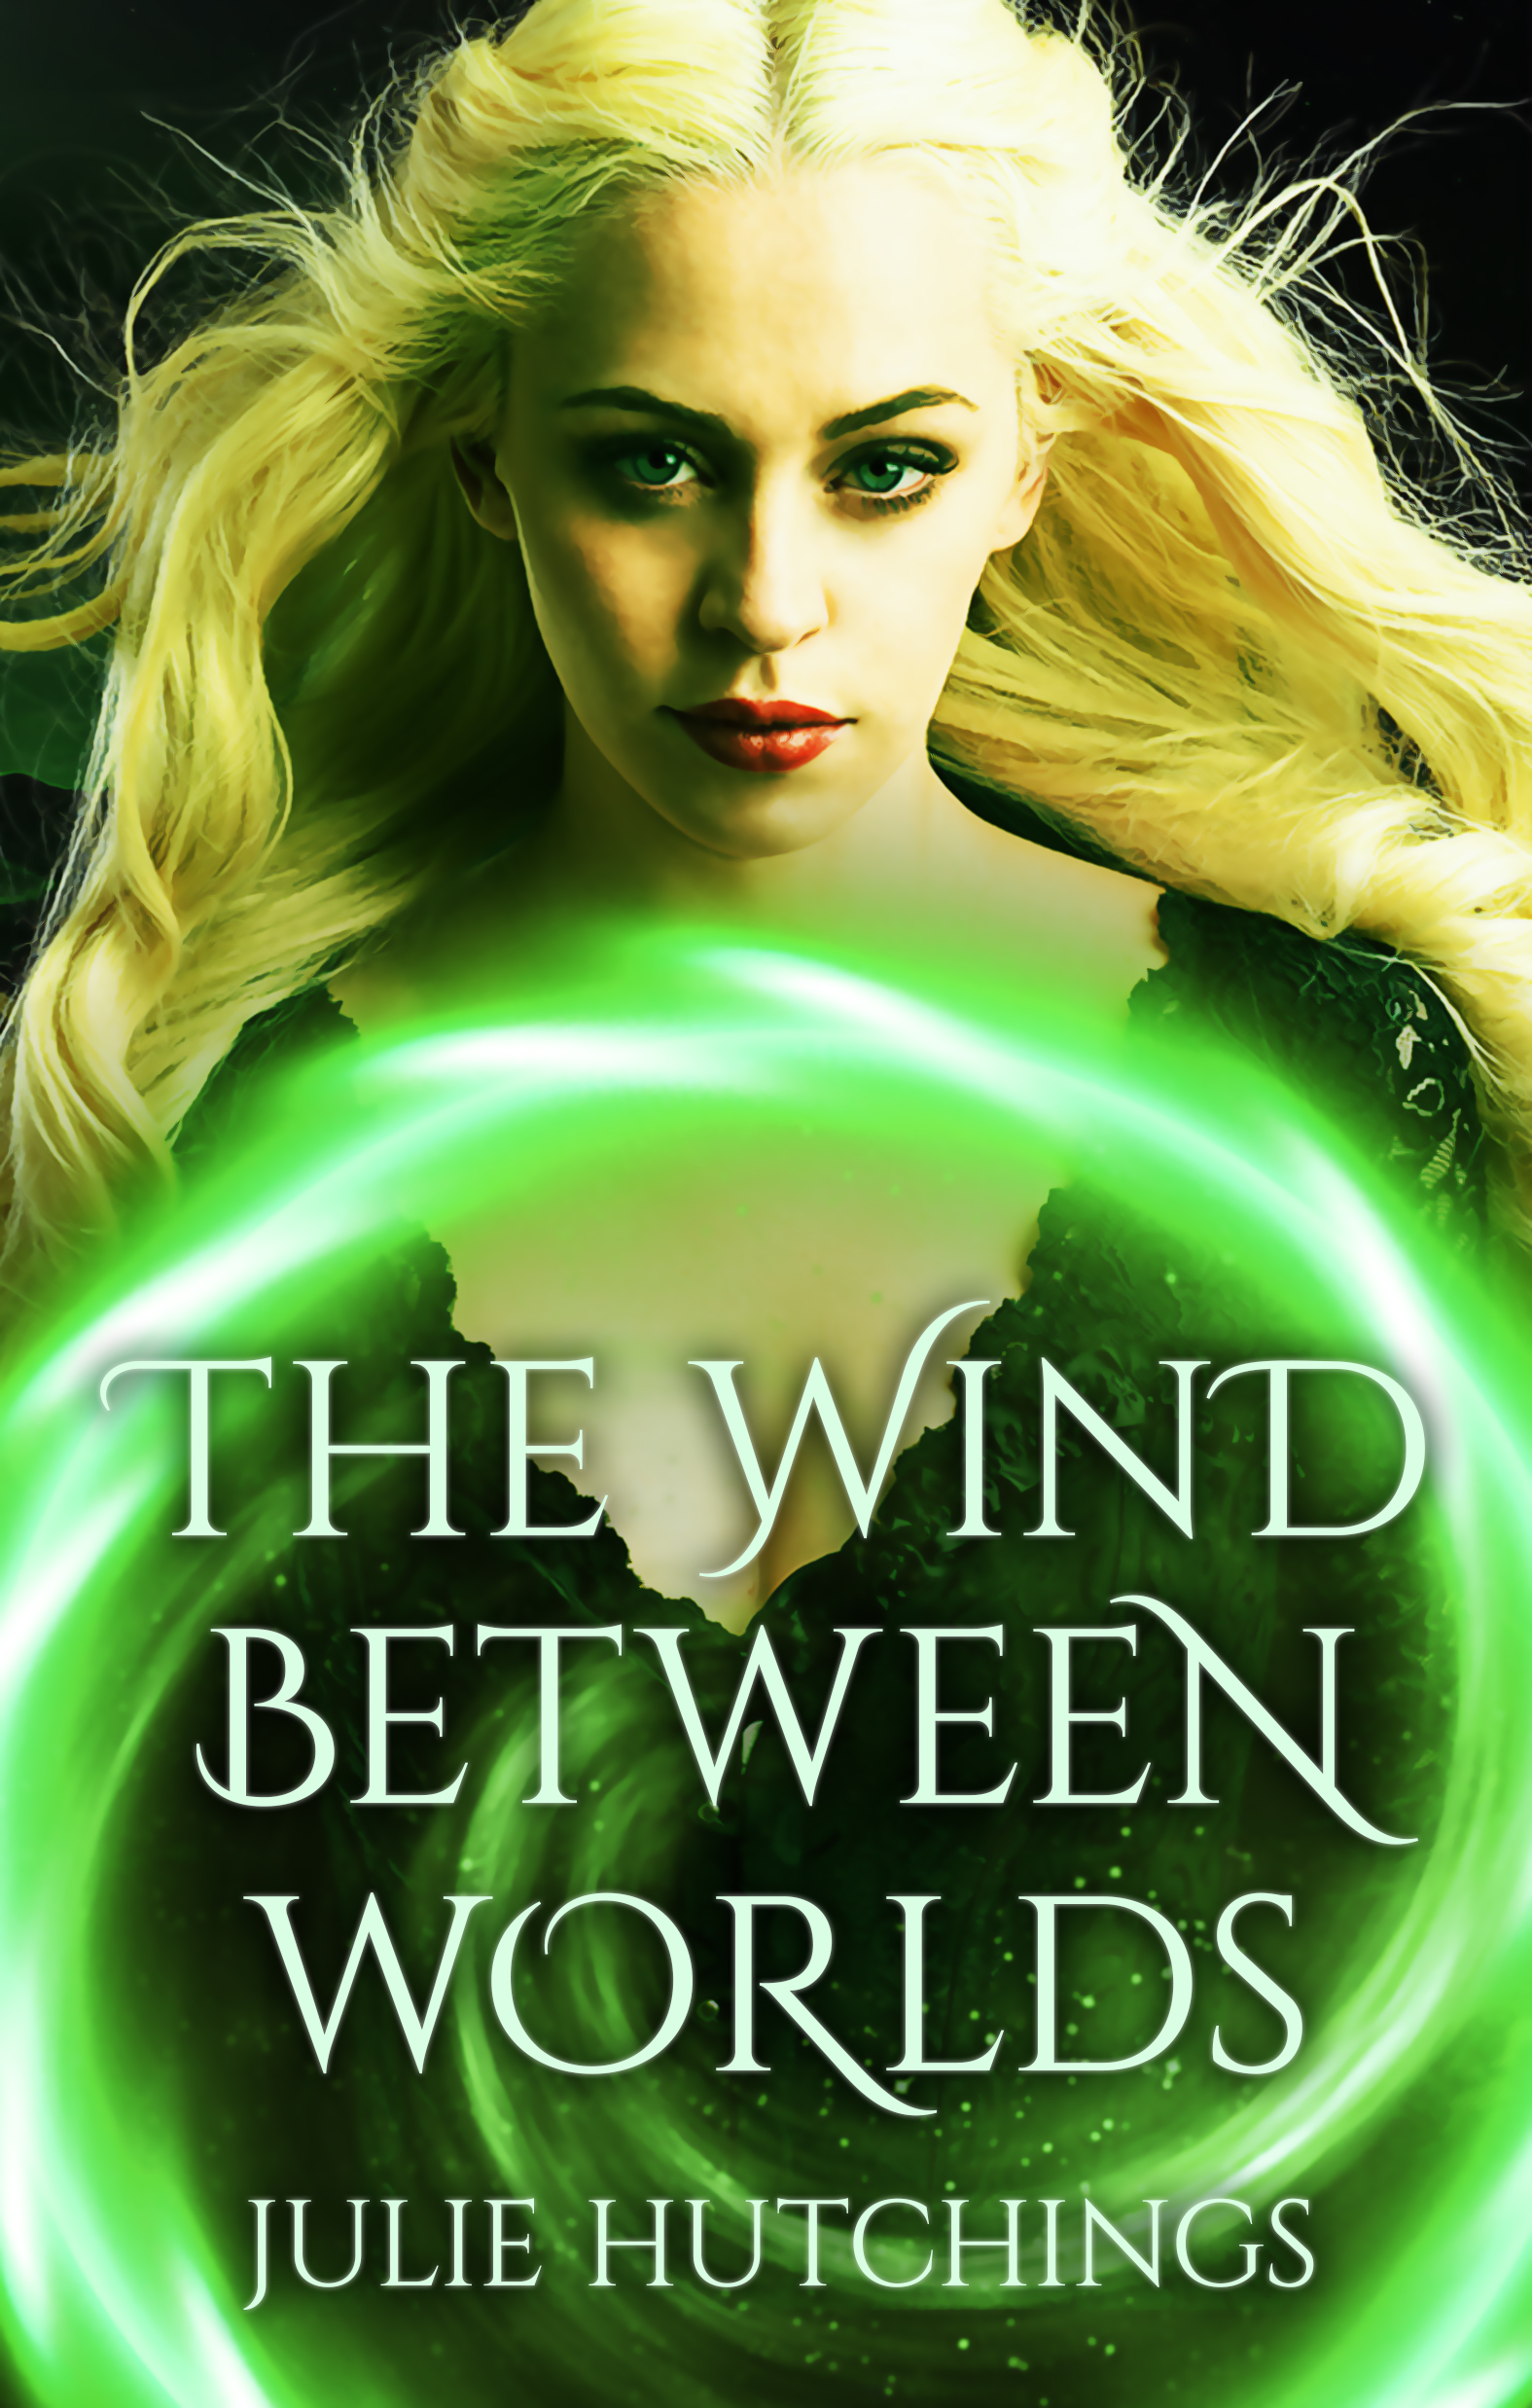 THE WIND BETWEEN WORLDS 1.jpg